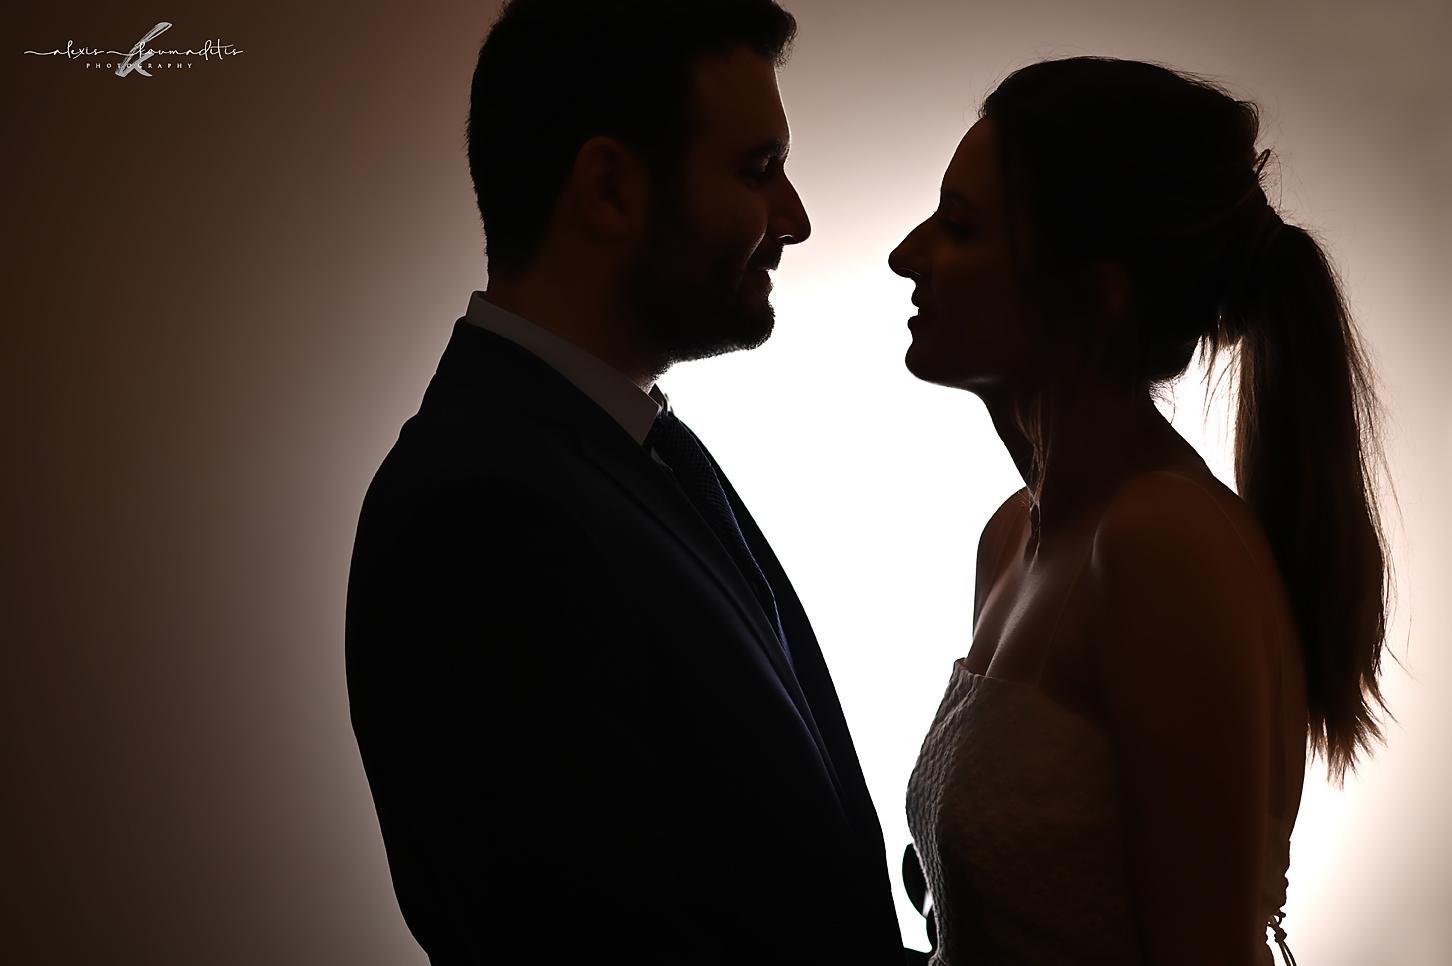 wedding-photography-platamon-love-bride-groom-alexis-koumaditis-01